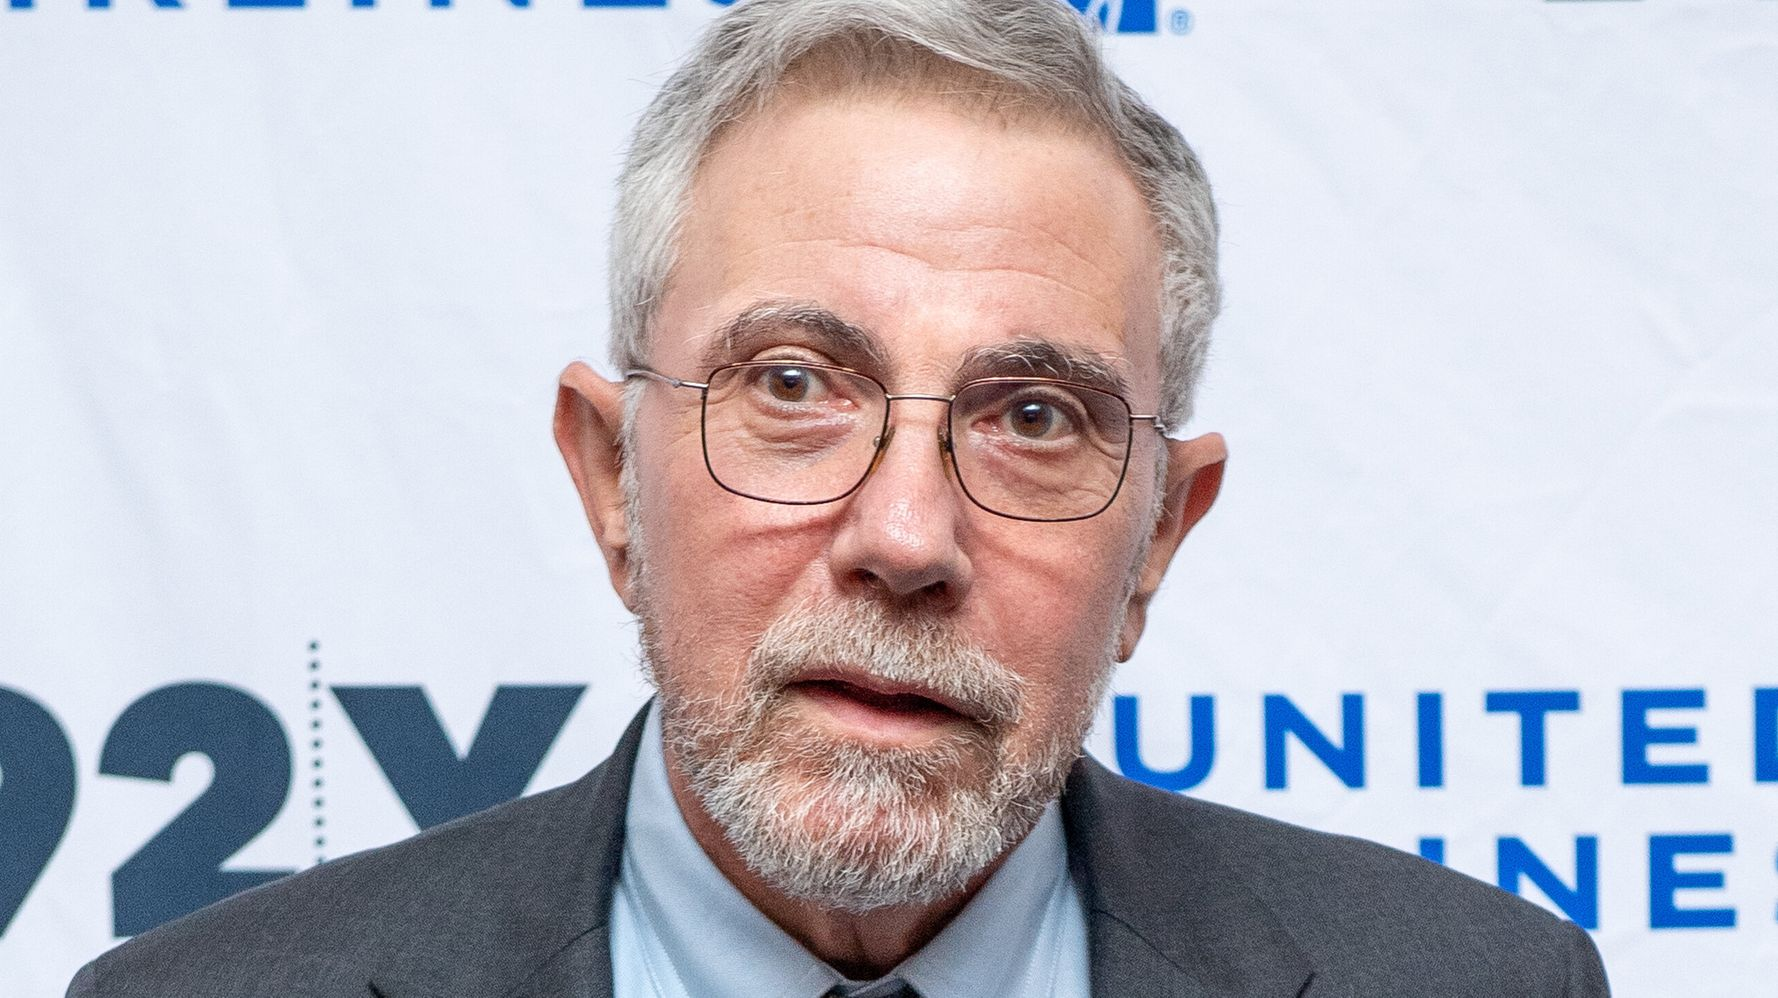 Paul Krugman Sinks Donald Trump With A Titanic Analogy About His Coronavirus Failings